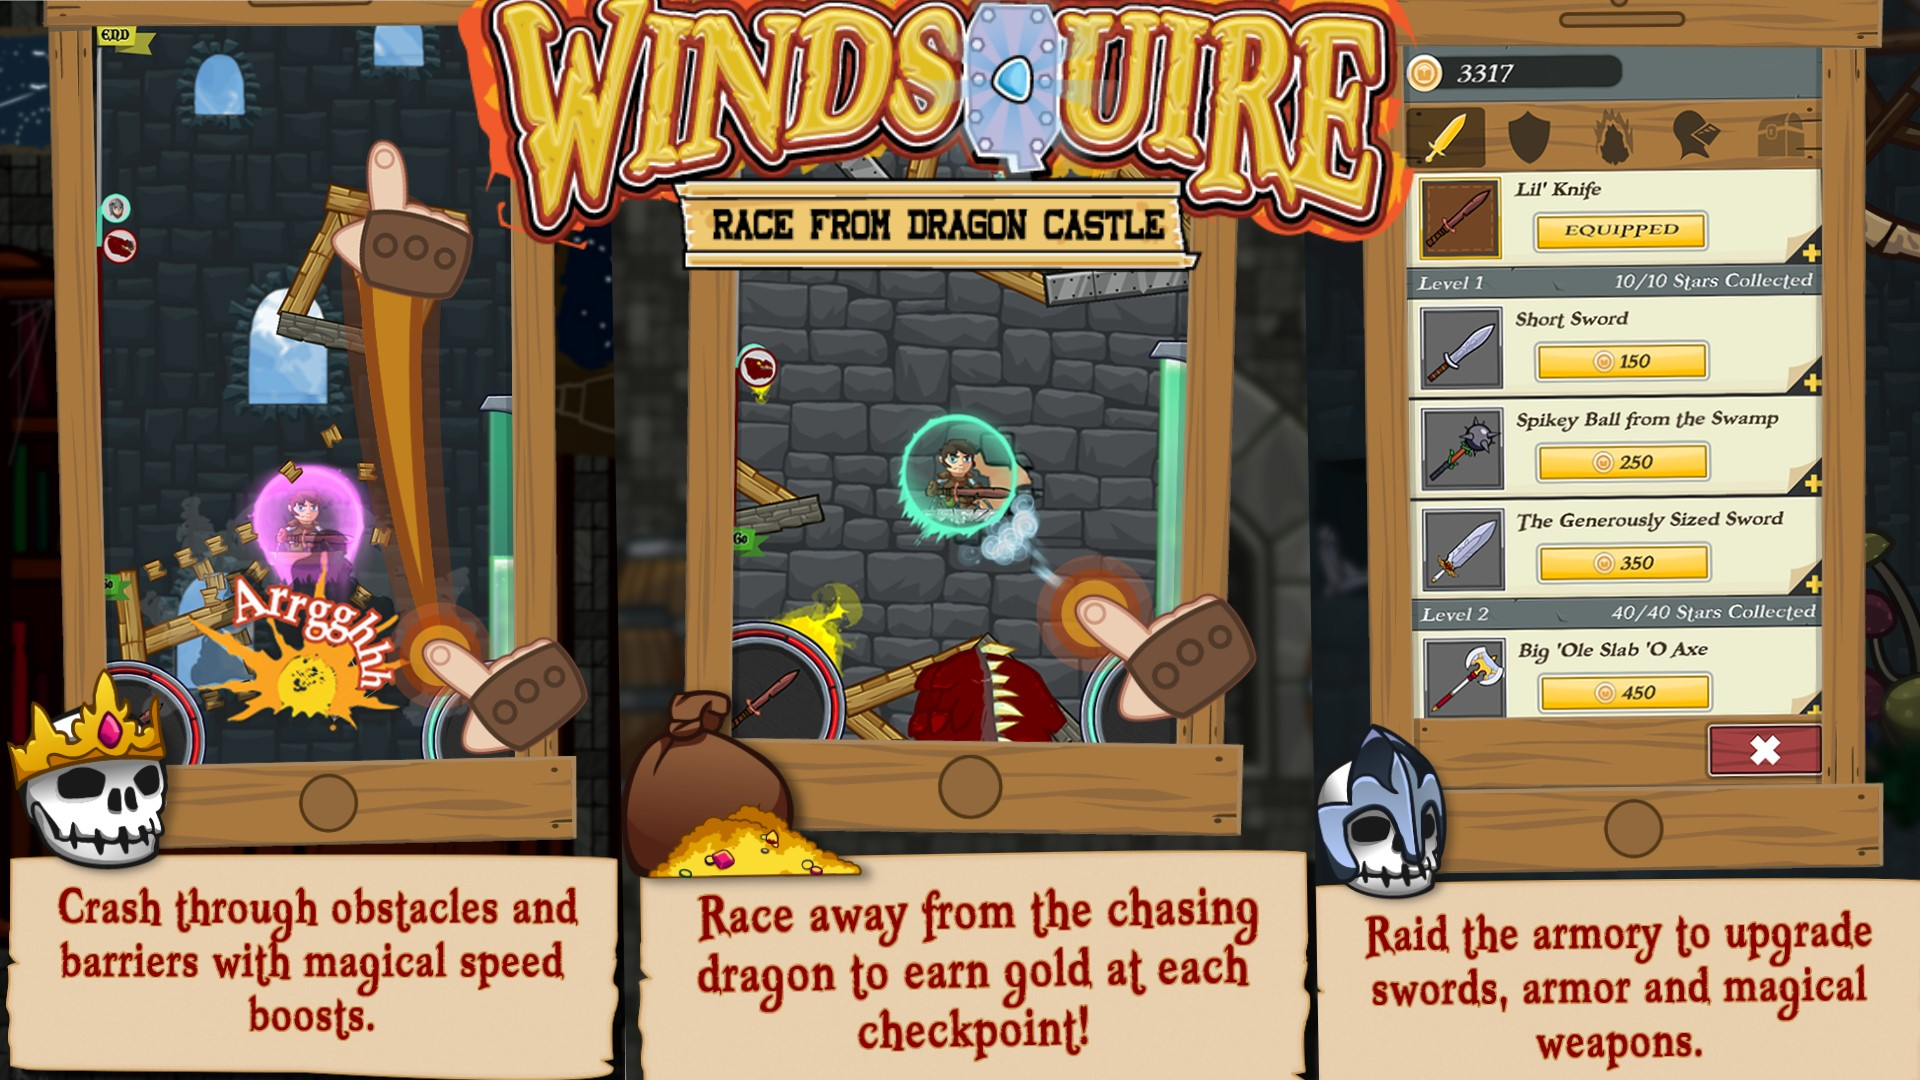 Windsquire beta